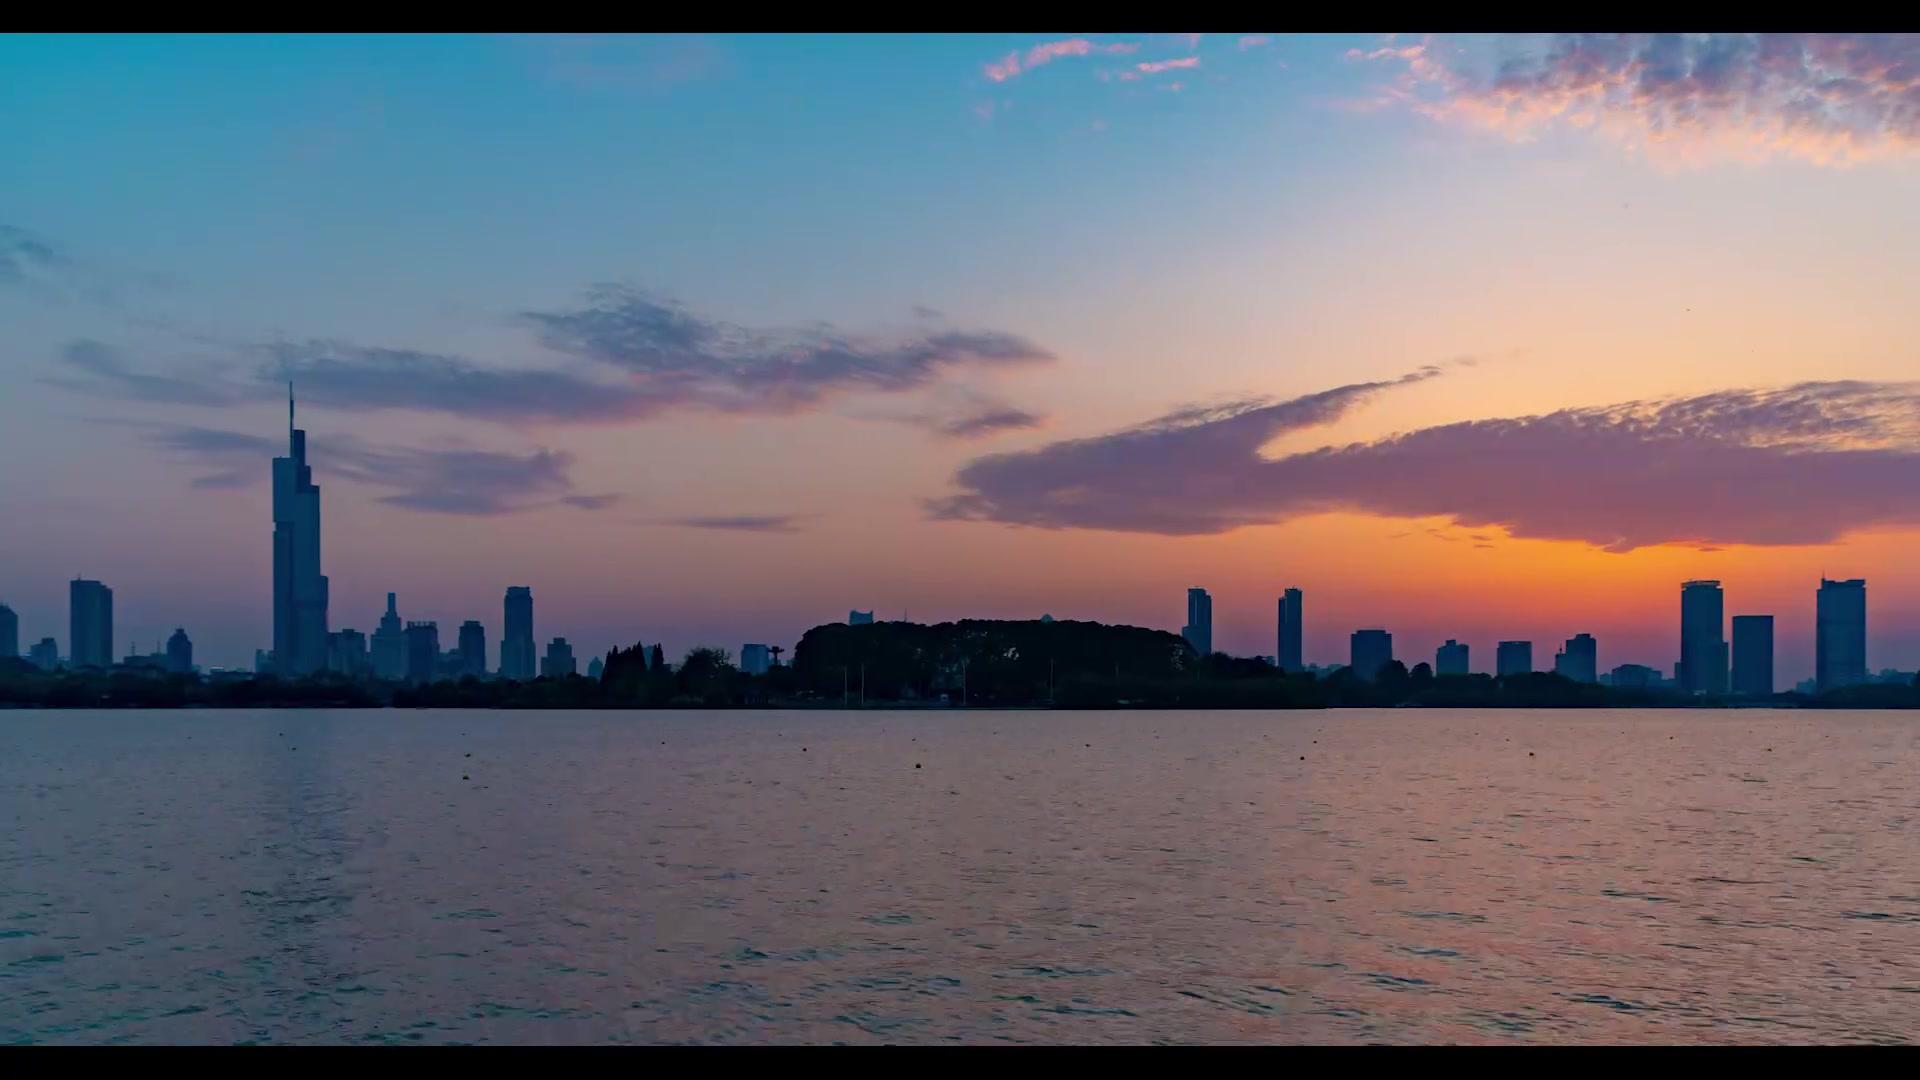 南京玄武湖公园延时摄影【2P比1P更精彩!】_哔哩哔哩 (゜-゜)つロ 干杯~-bilibili